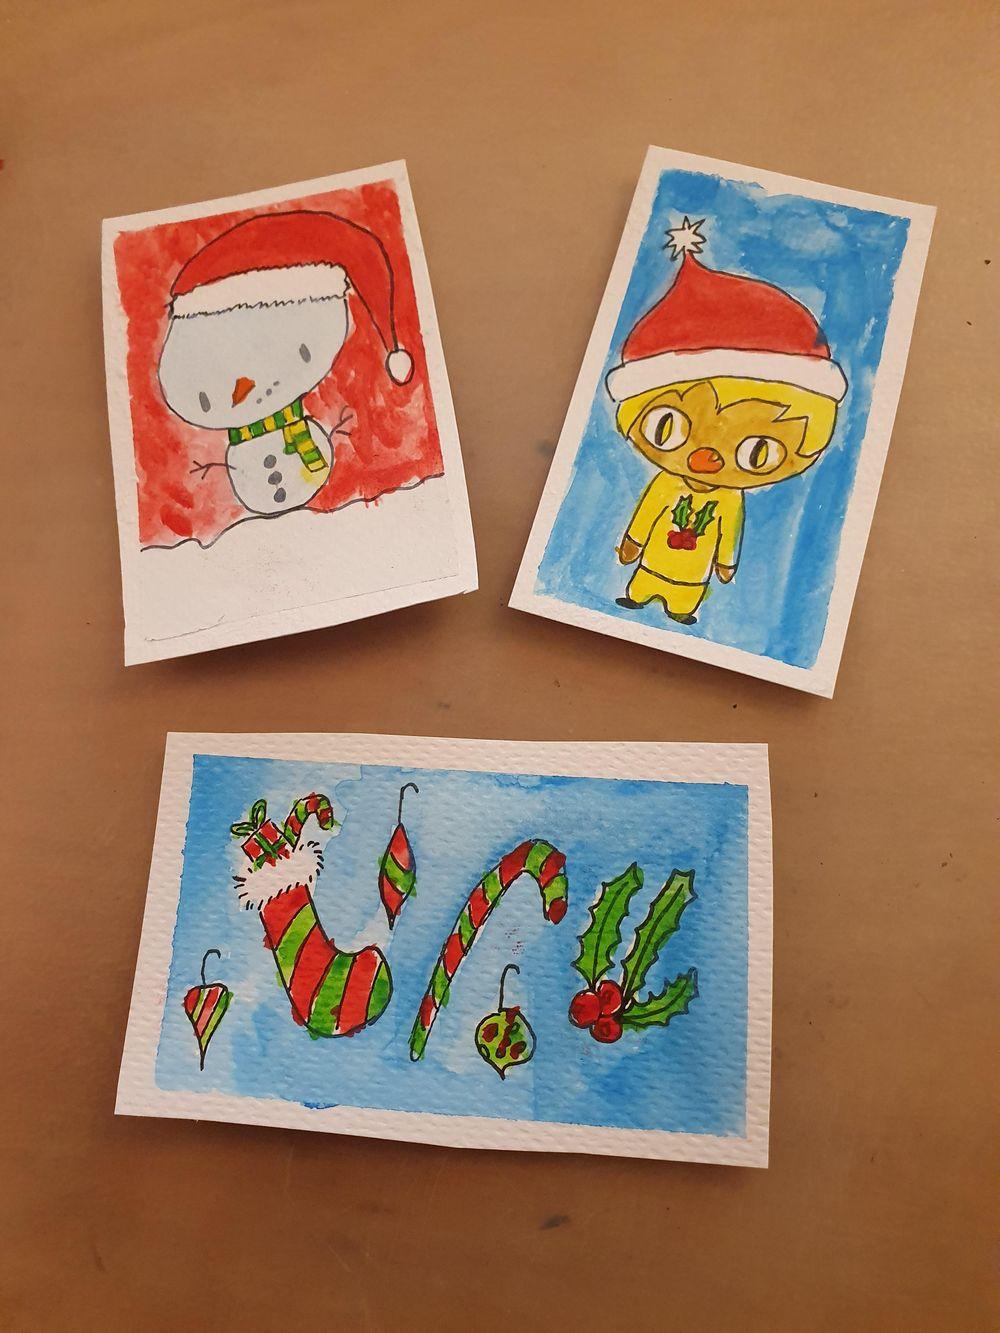 Cute chrismas cards - image 1 - student project